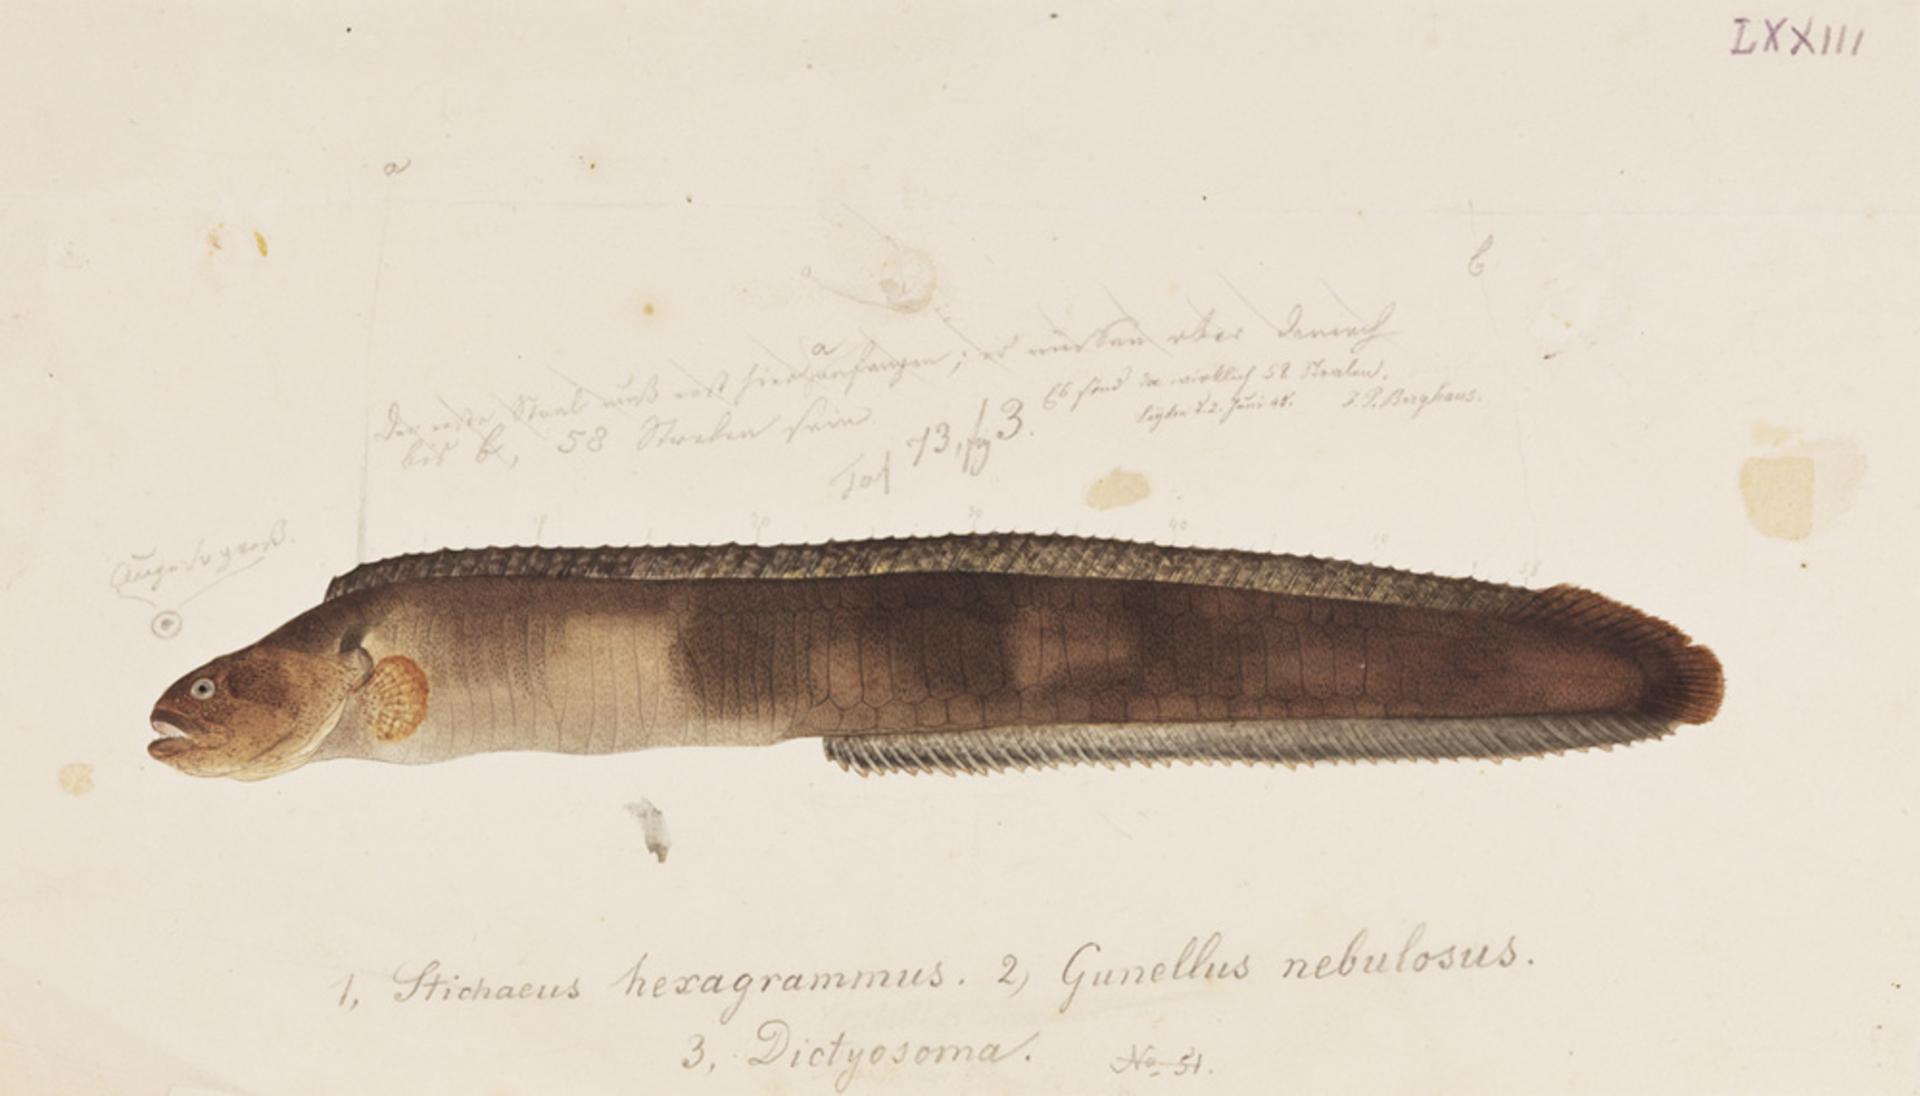 RMNH.ART.737   Dictysoma buergeri